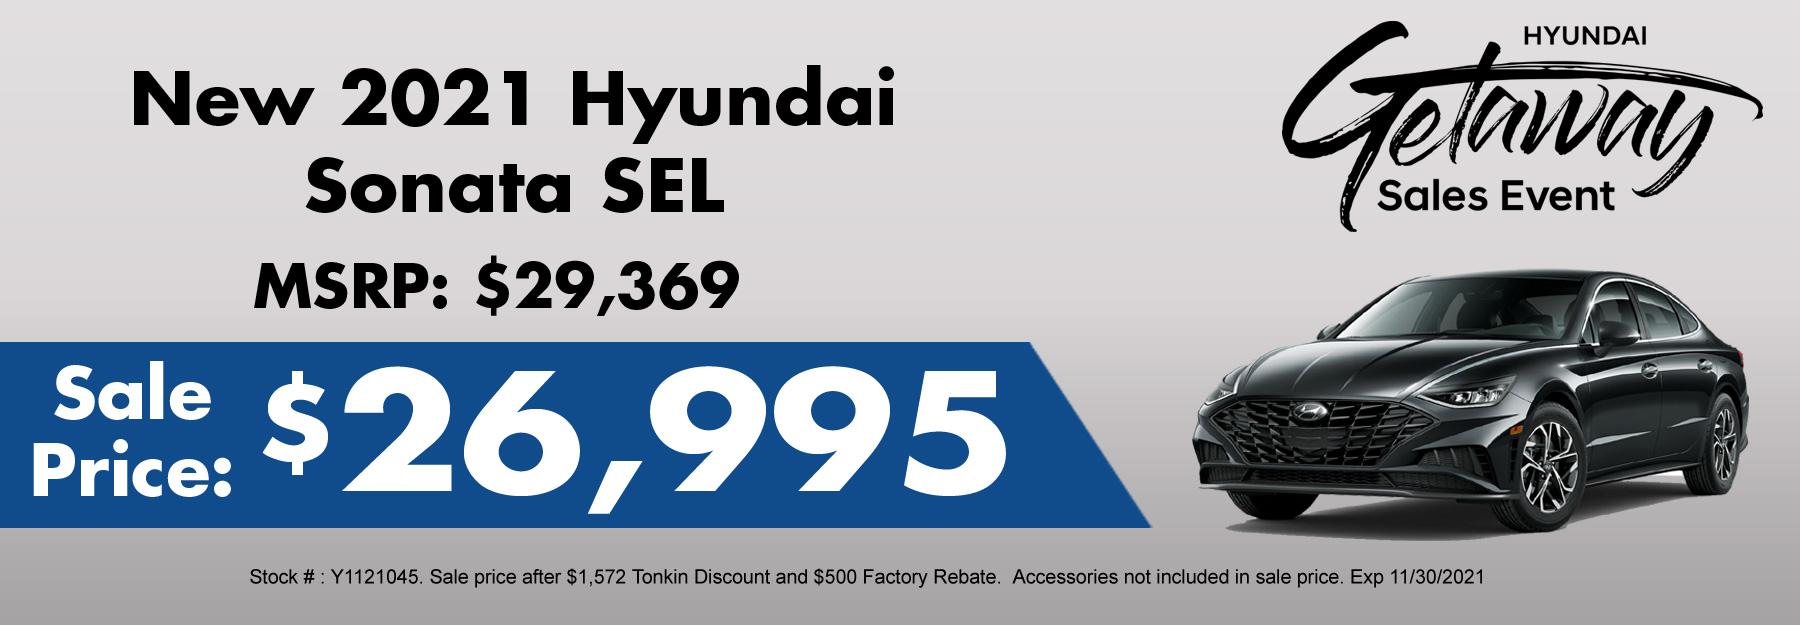 New Hyundai Sonata Special